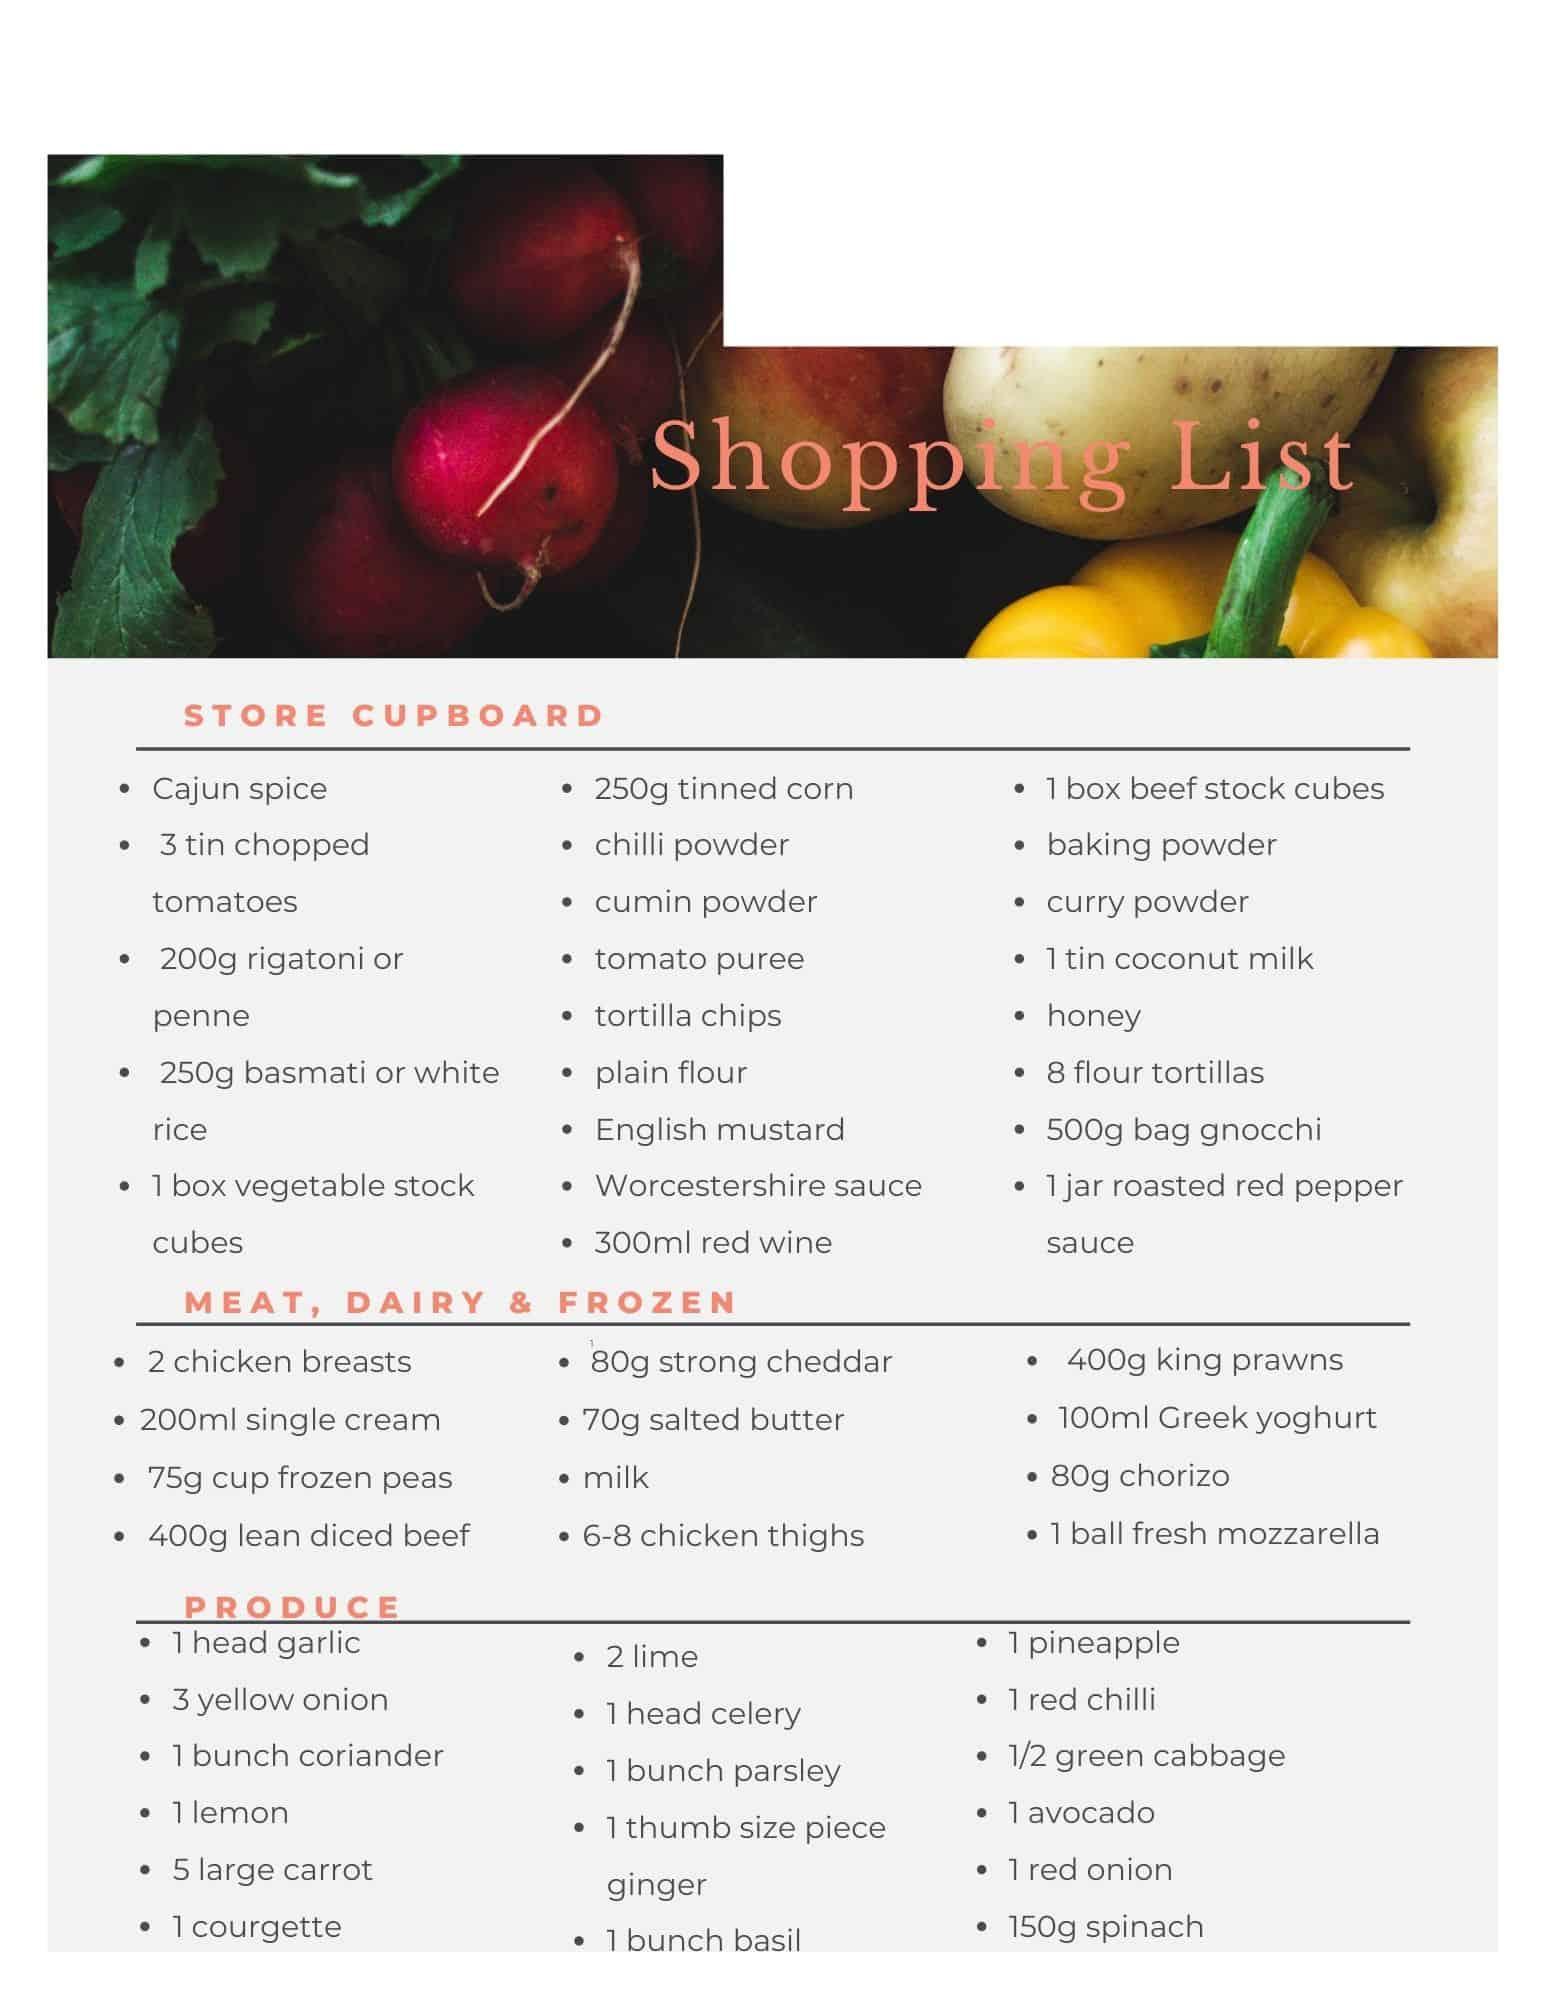 Aldi budget meal plan shopping list